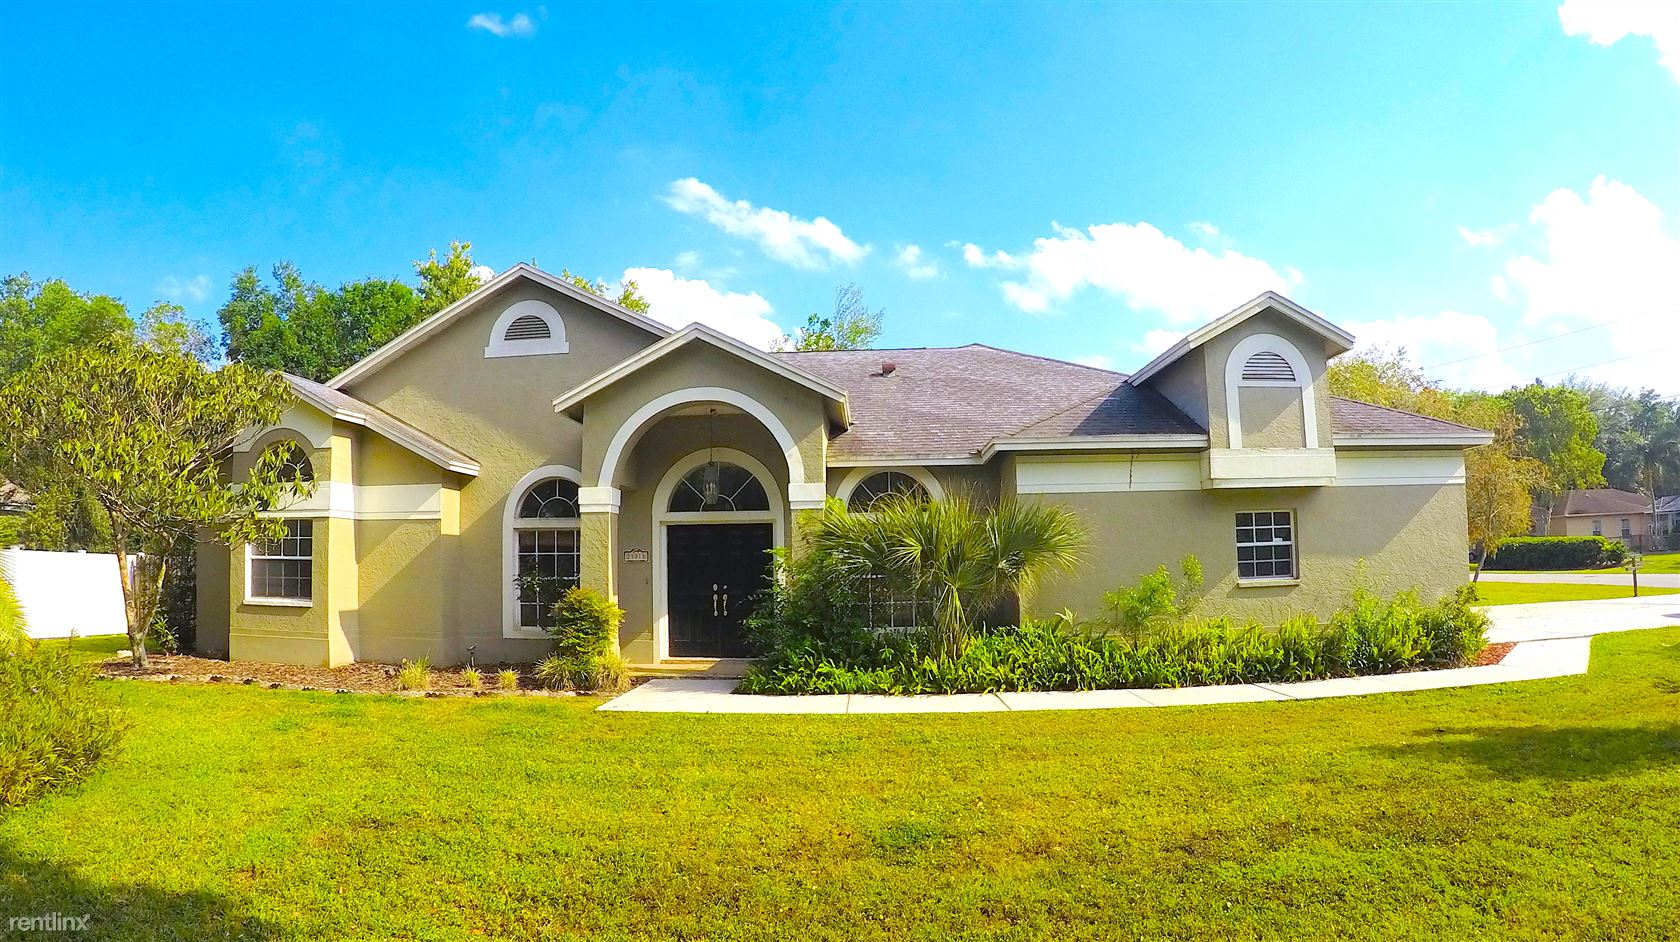 25018 Bristlecone Ct, Land O Lakes, FL - $2,395